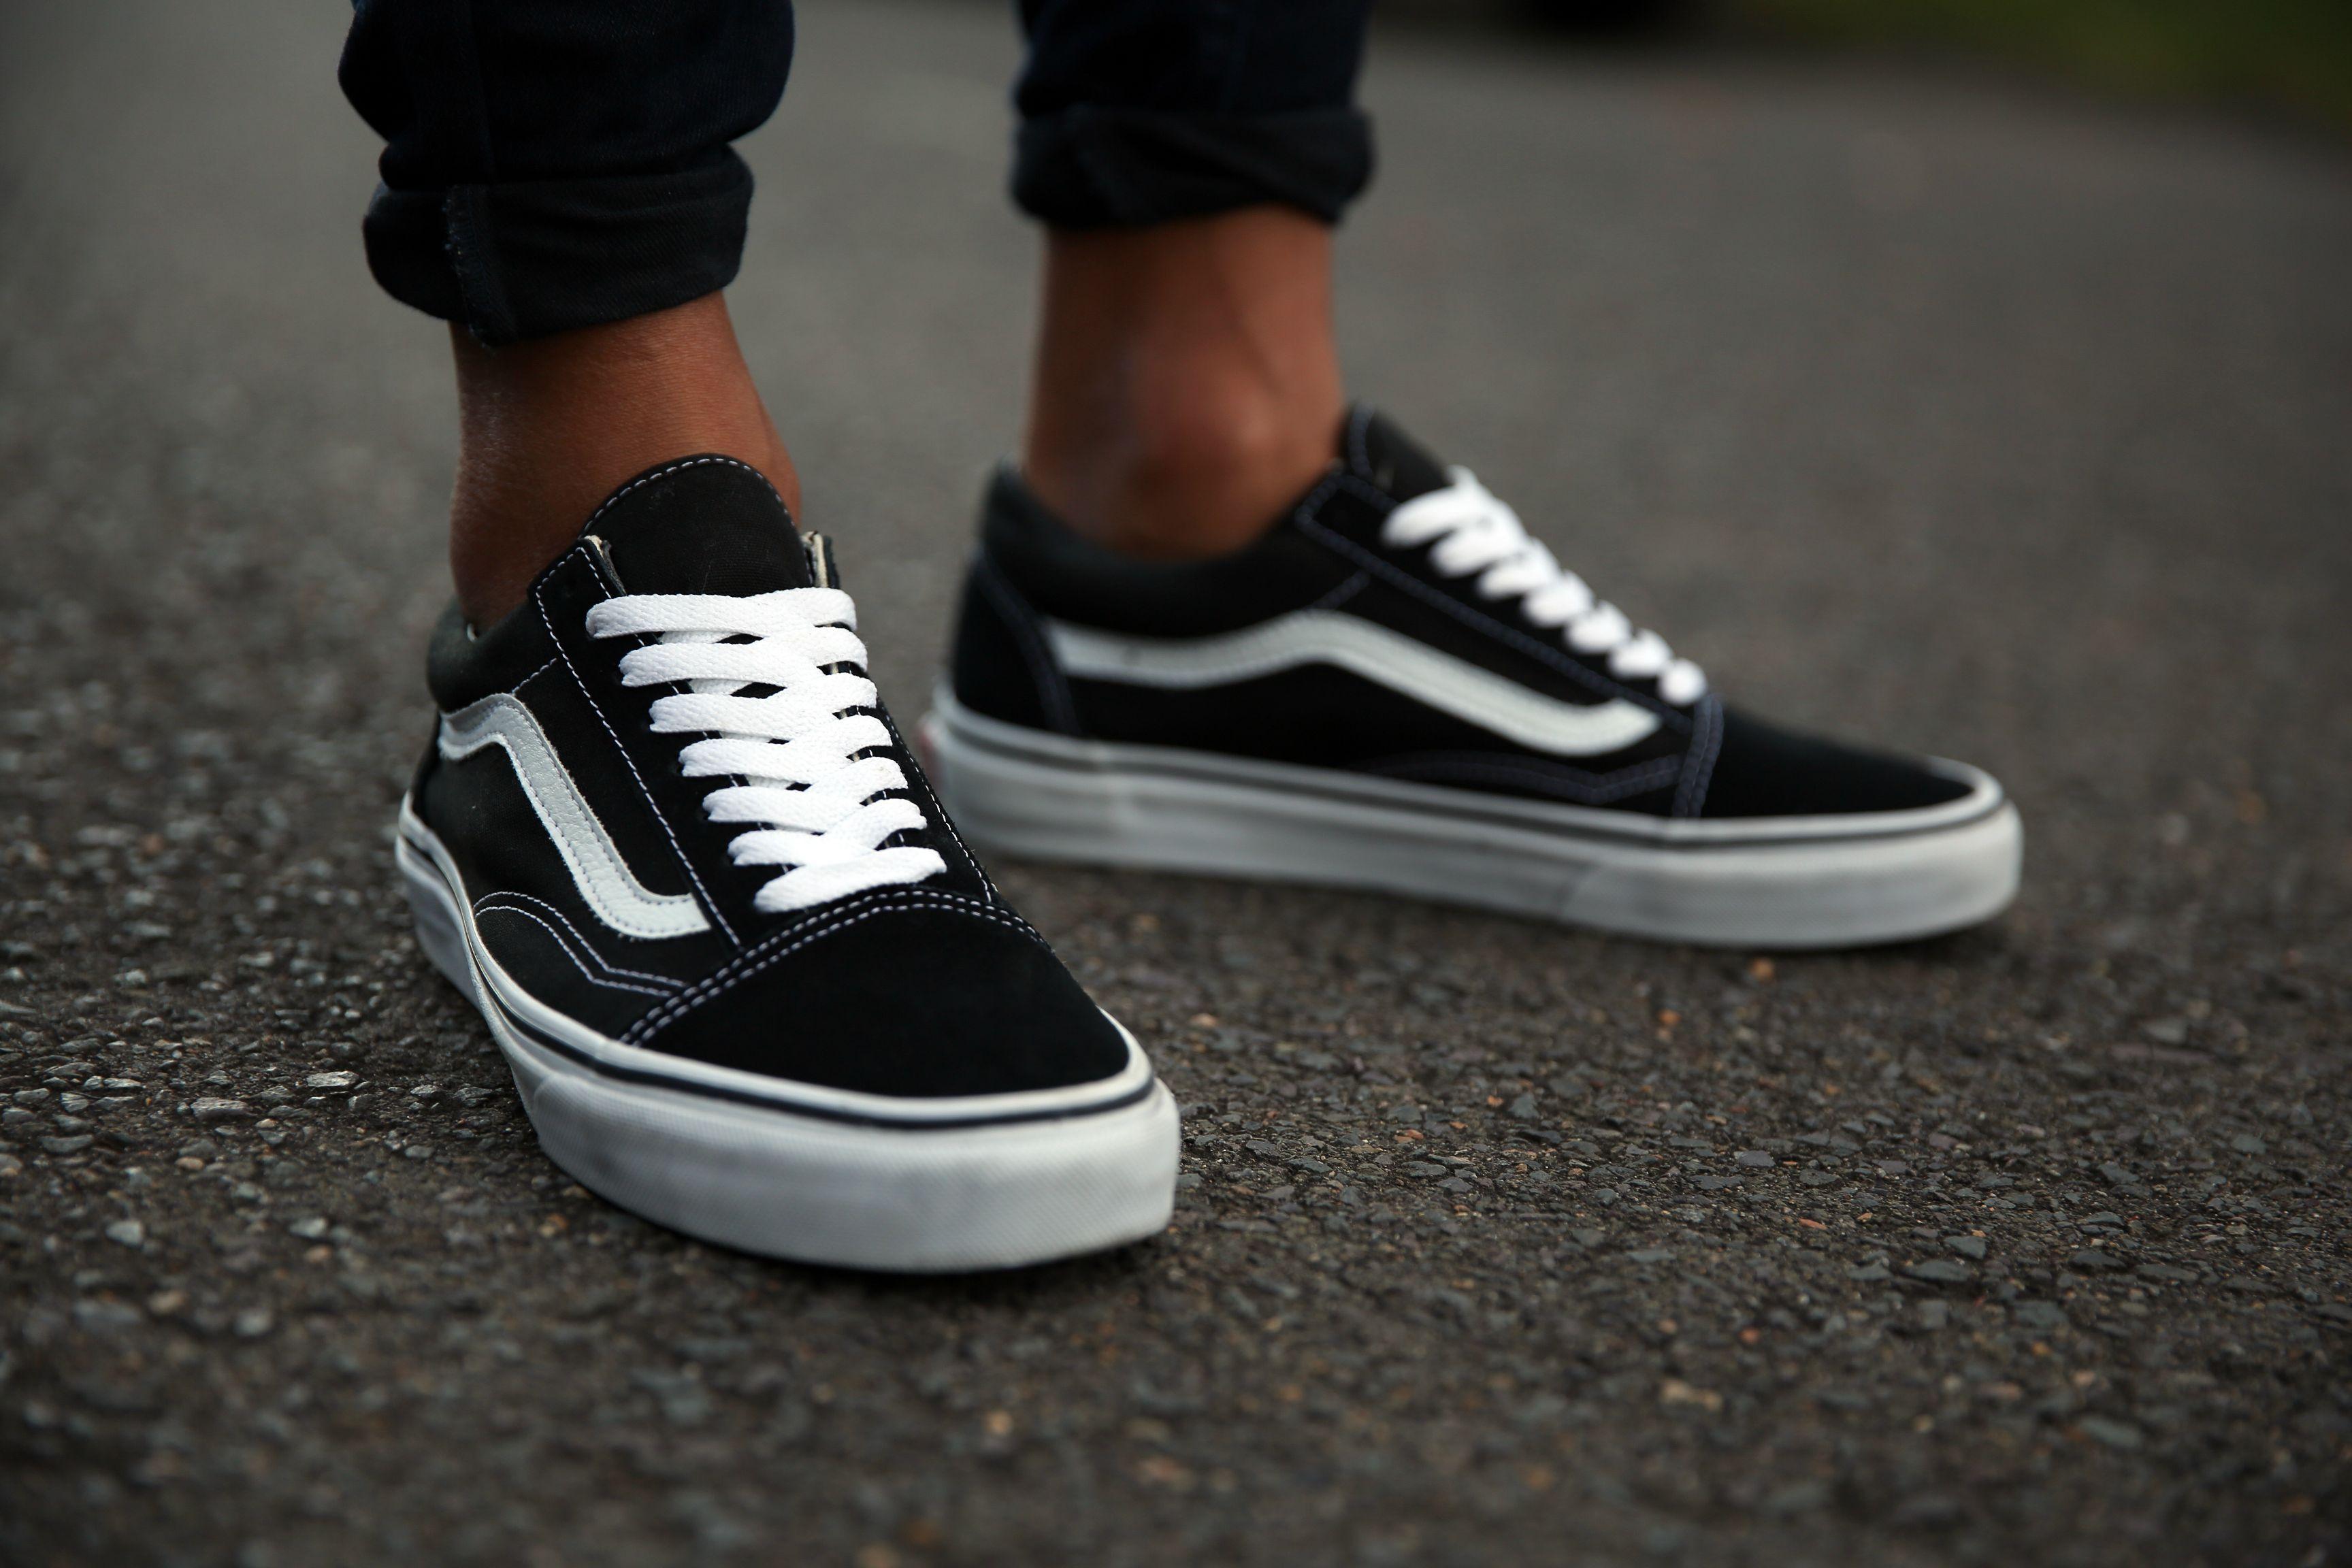 The Ultimate Guide To Sneakers & Sneaker Brands   Vans old